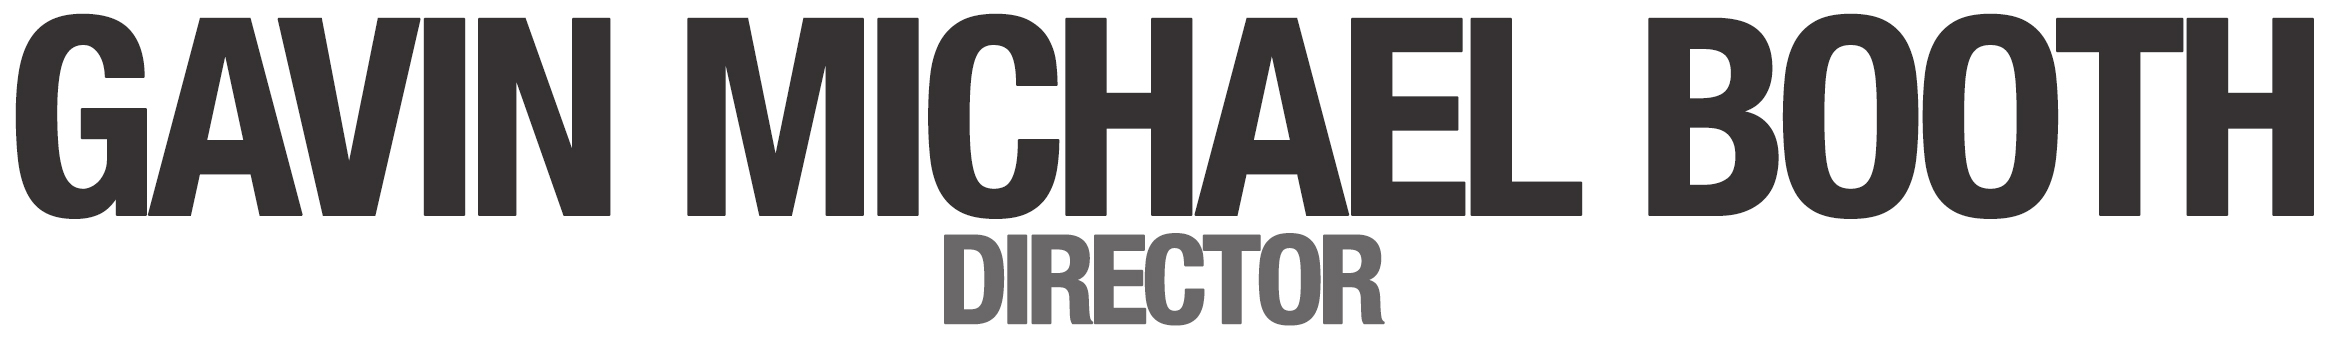 Gavin Michael Booth Logo